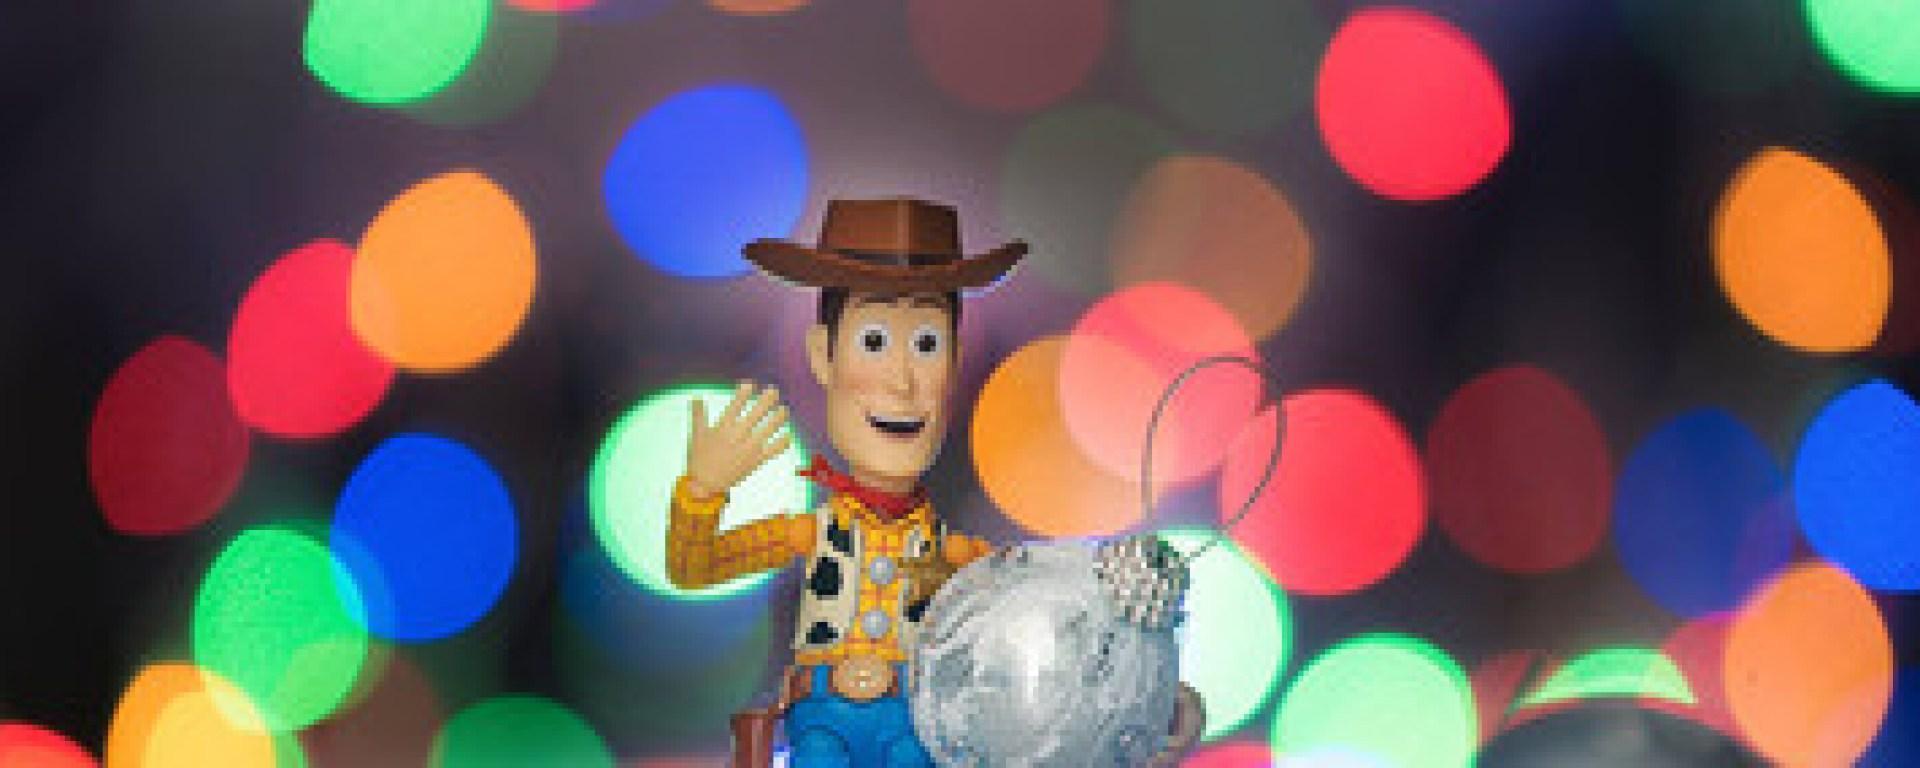 Toy Story 4   Disney lanza un nuevo teaser con Woody 8a16f73d86d